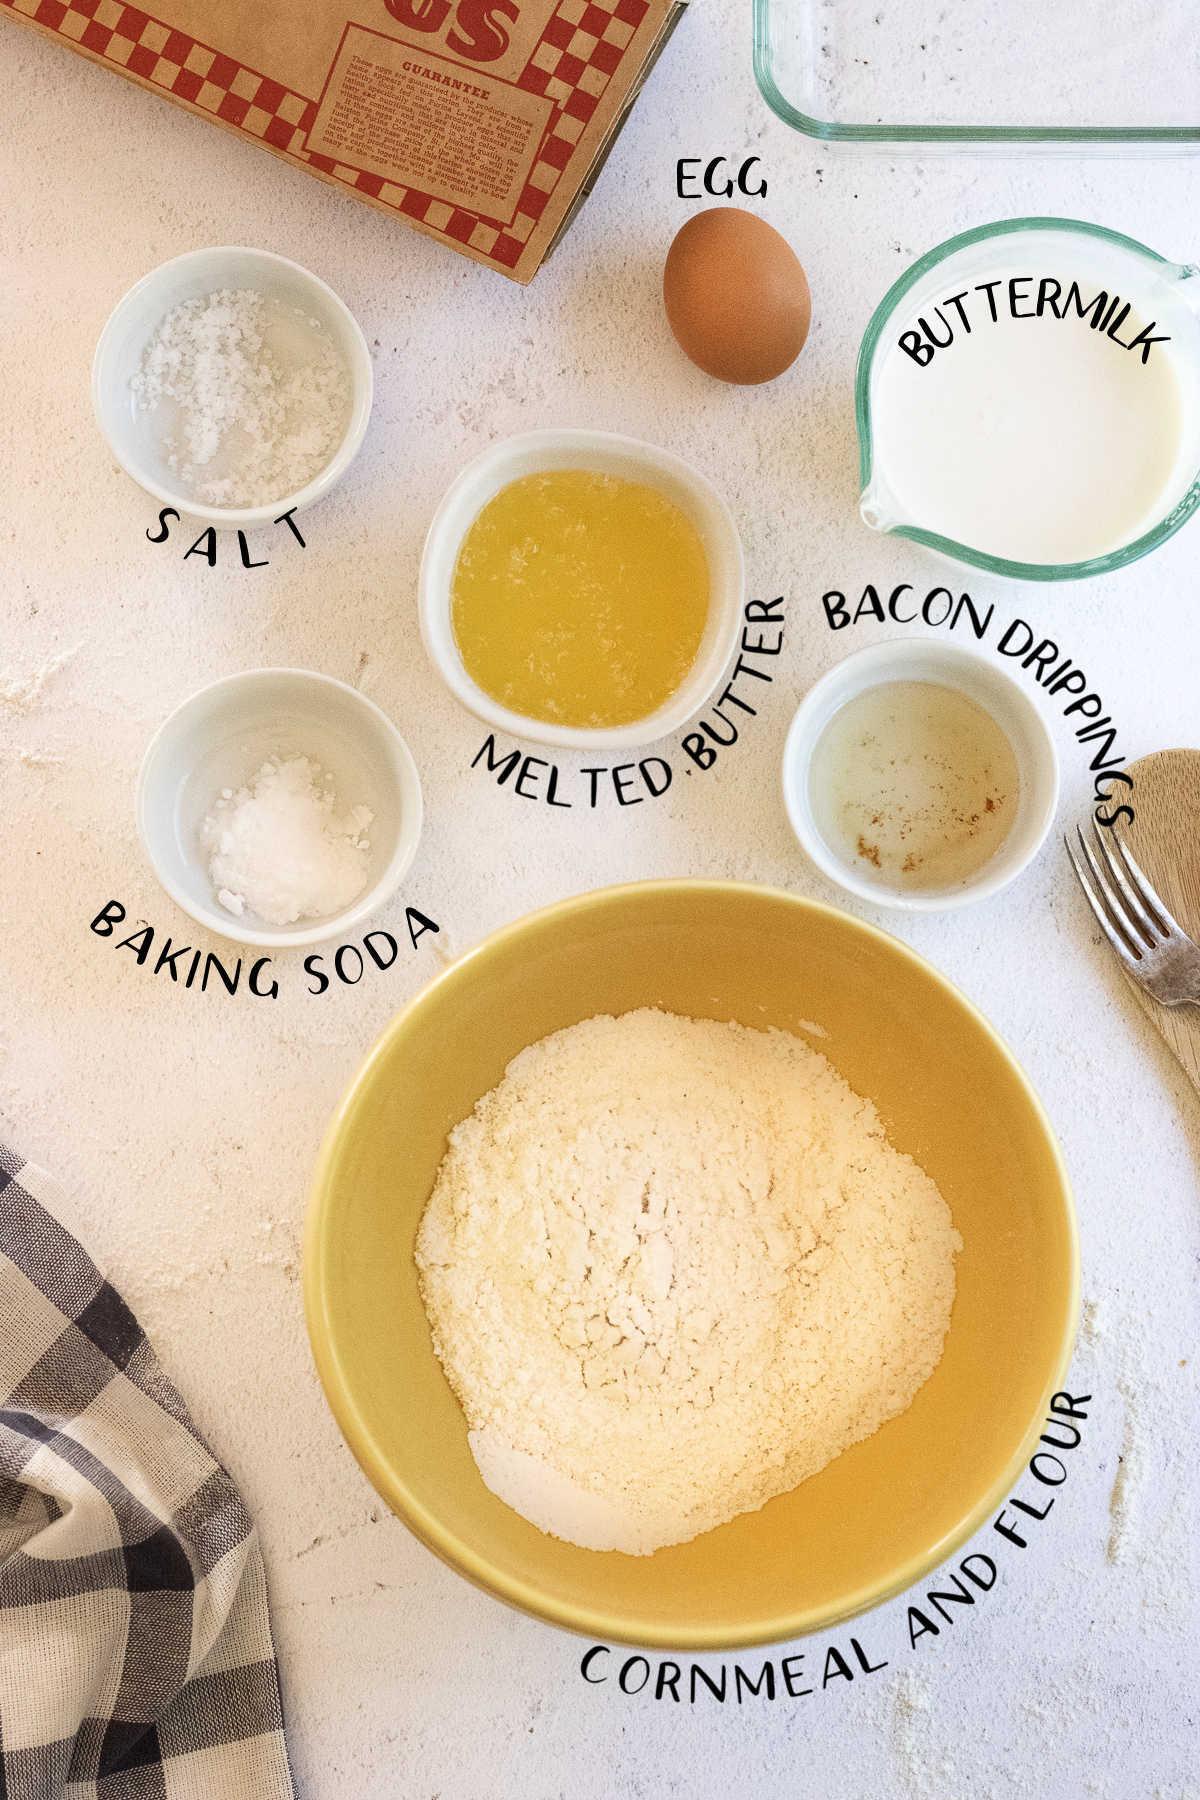 Ingredients for cornbread.